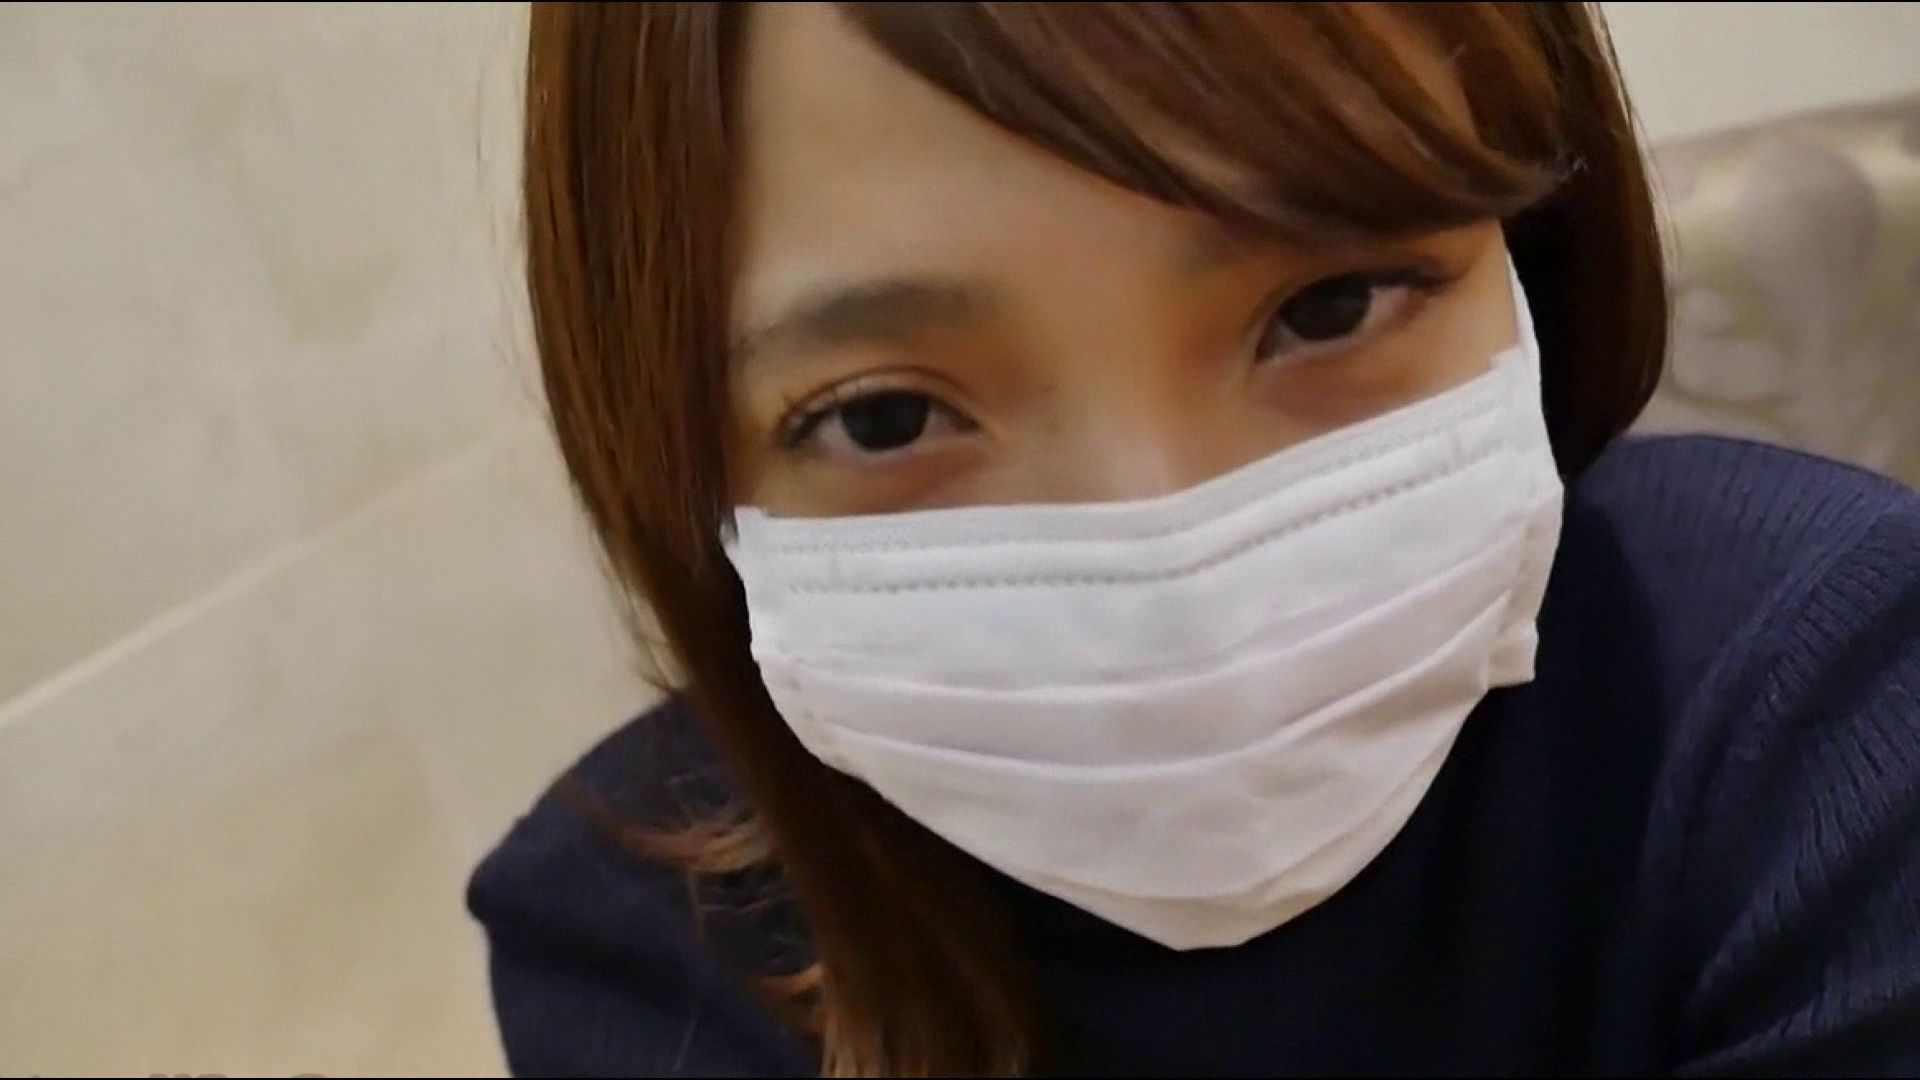 S級厳選美女ビッチガールVol.41 前編 OL女体  105連発 46